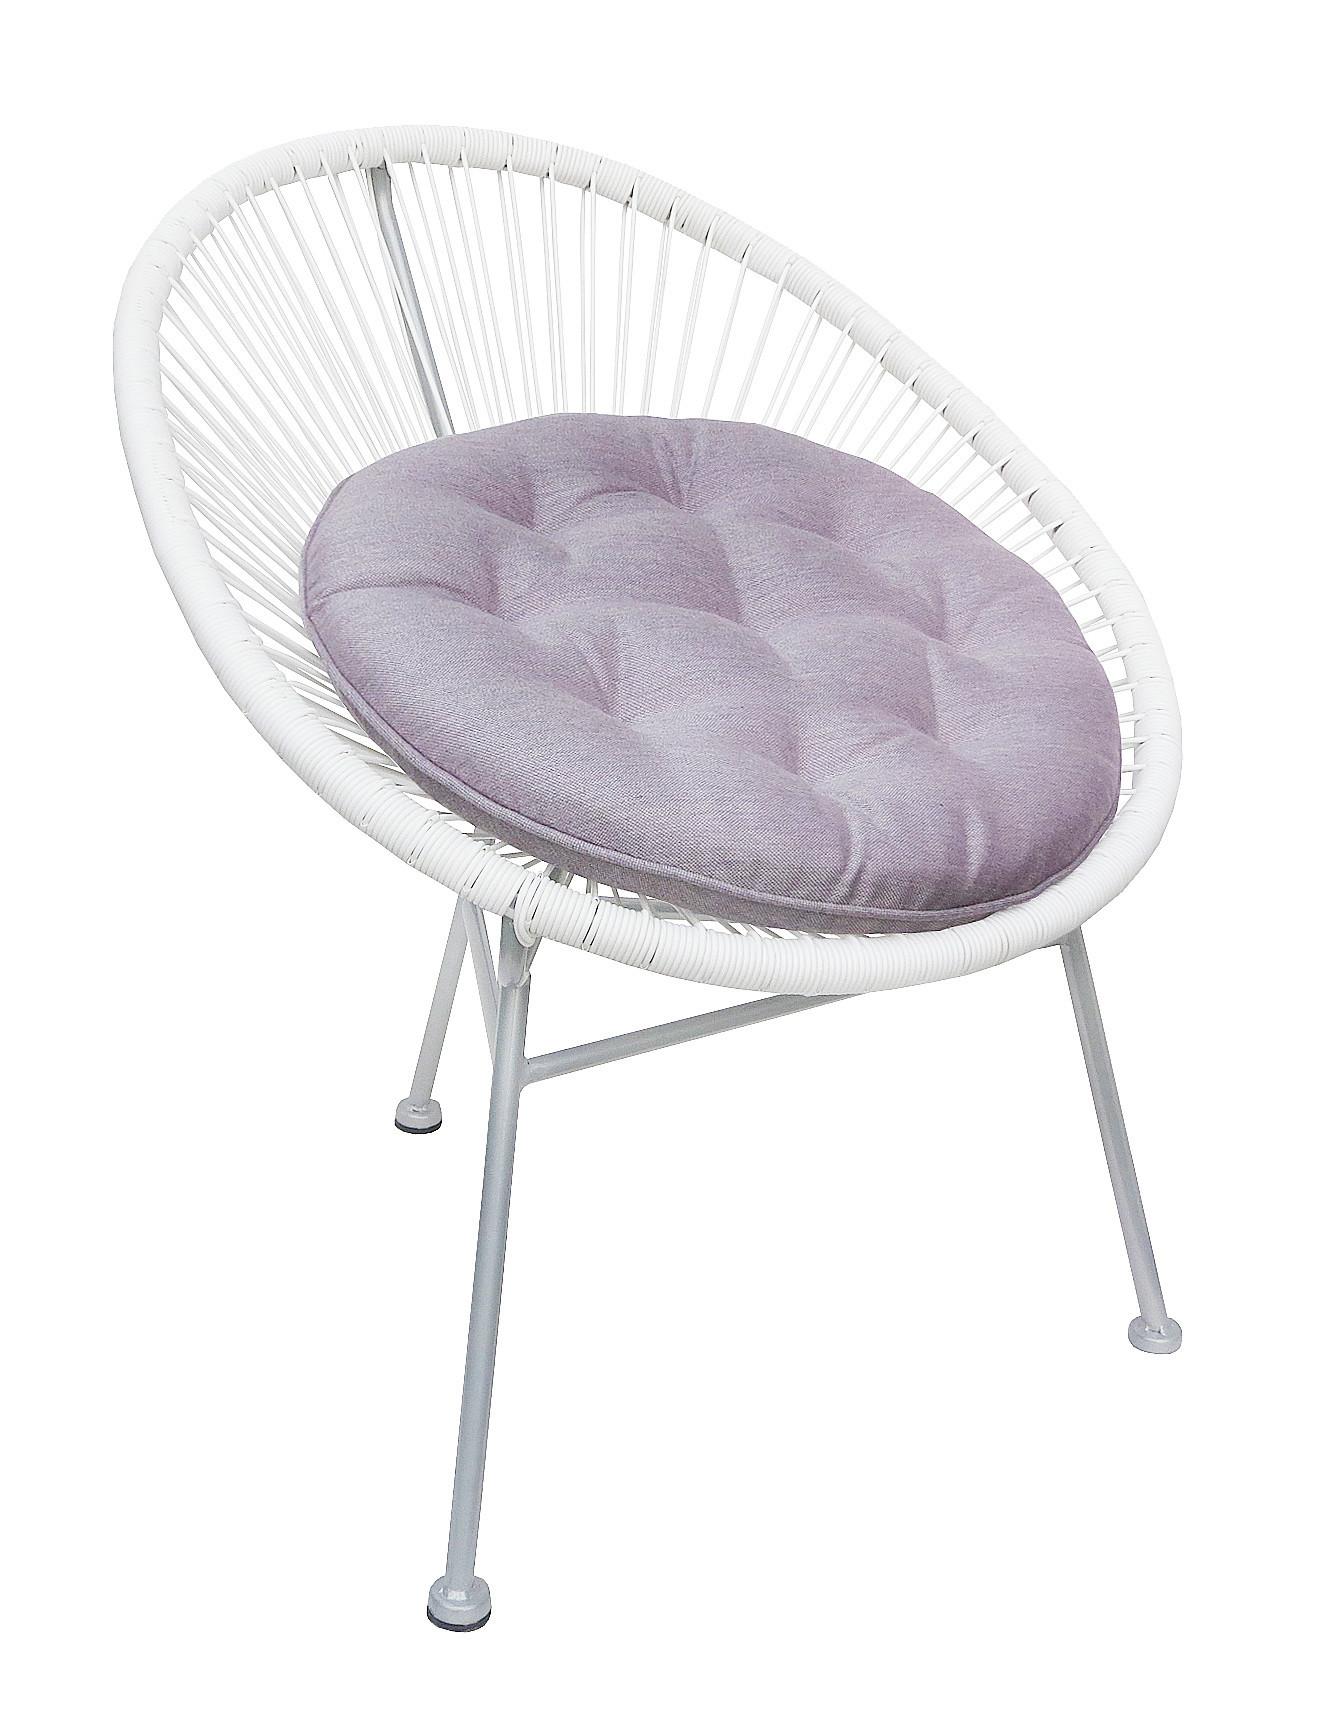 NEW-Alison-Acapulco-Chair-Cushion